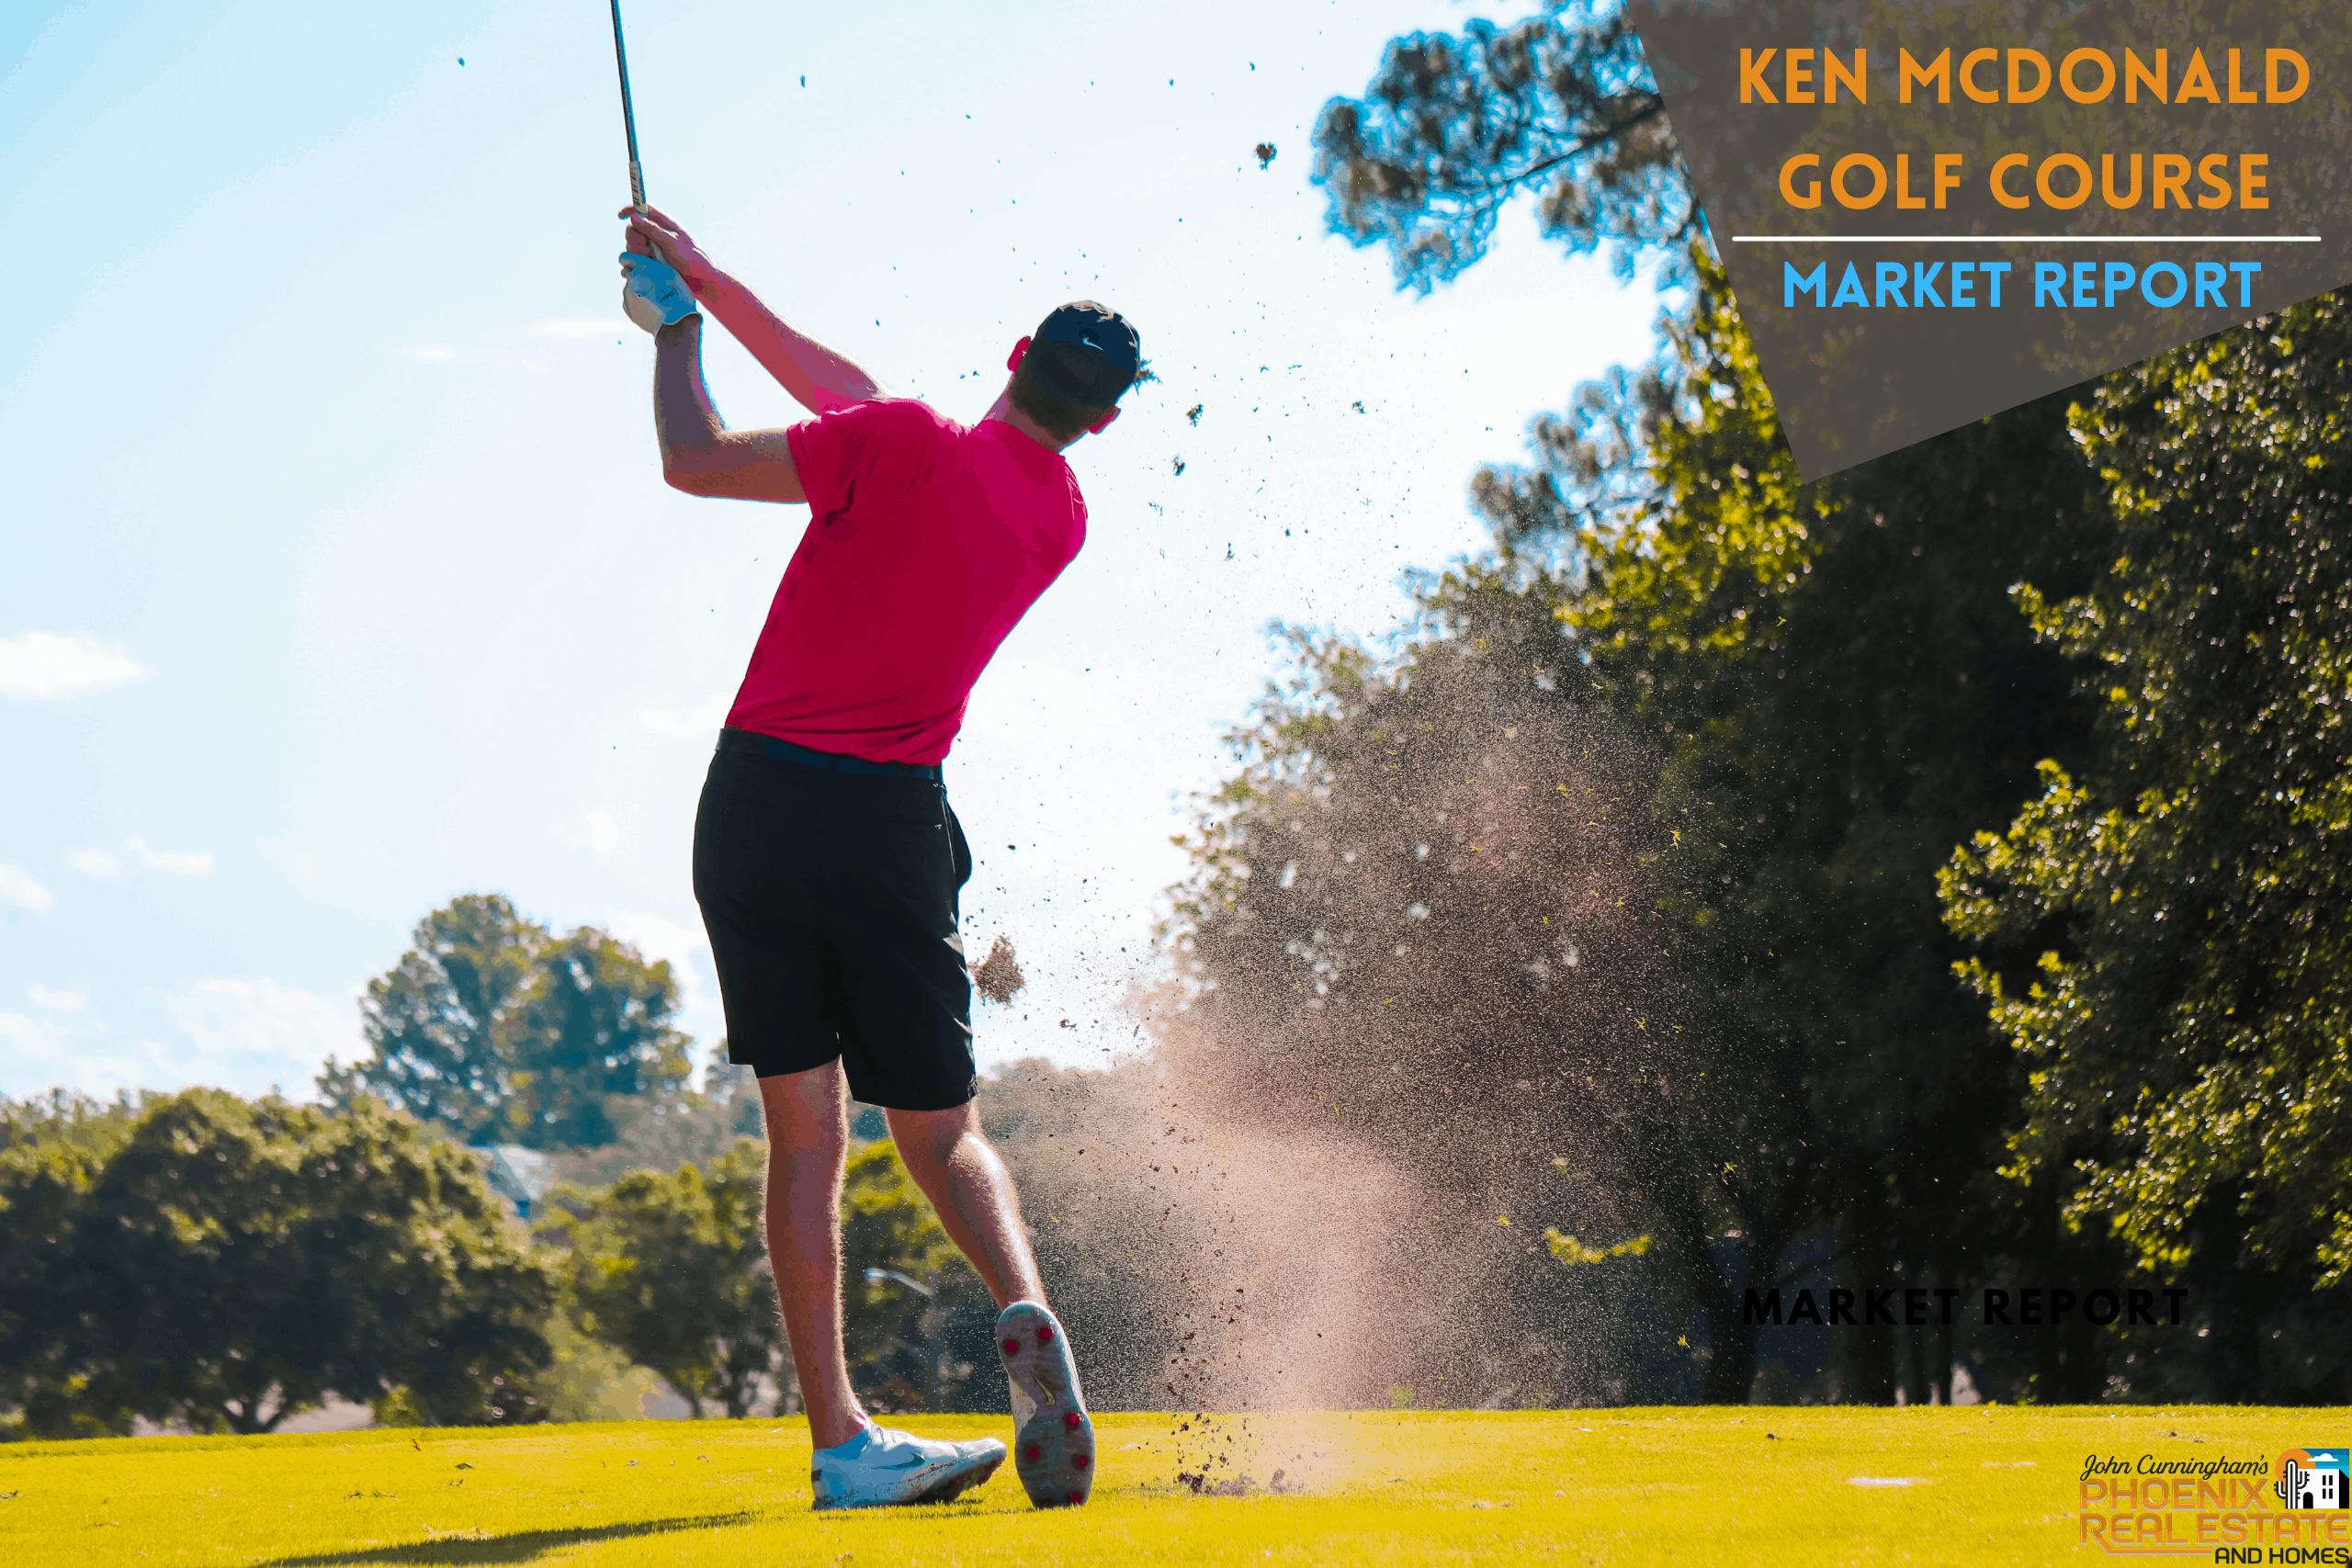 Ken McDonald Golf Course Market Report